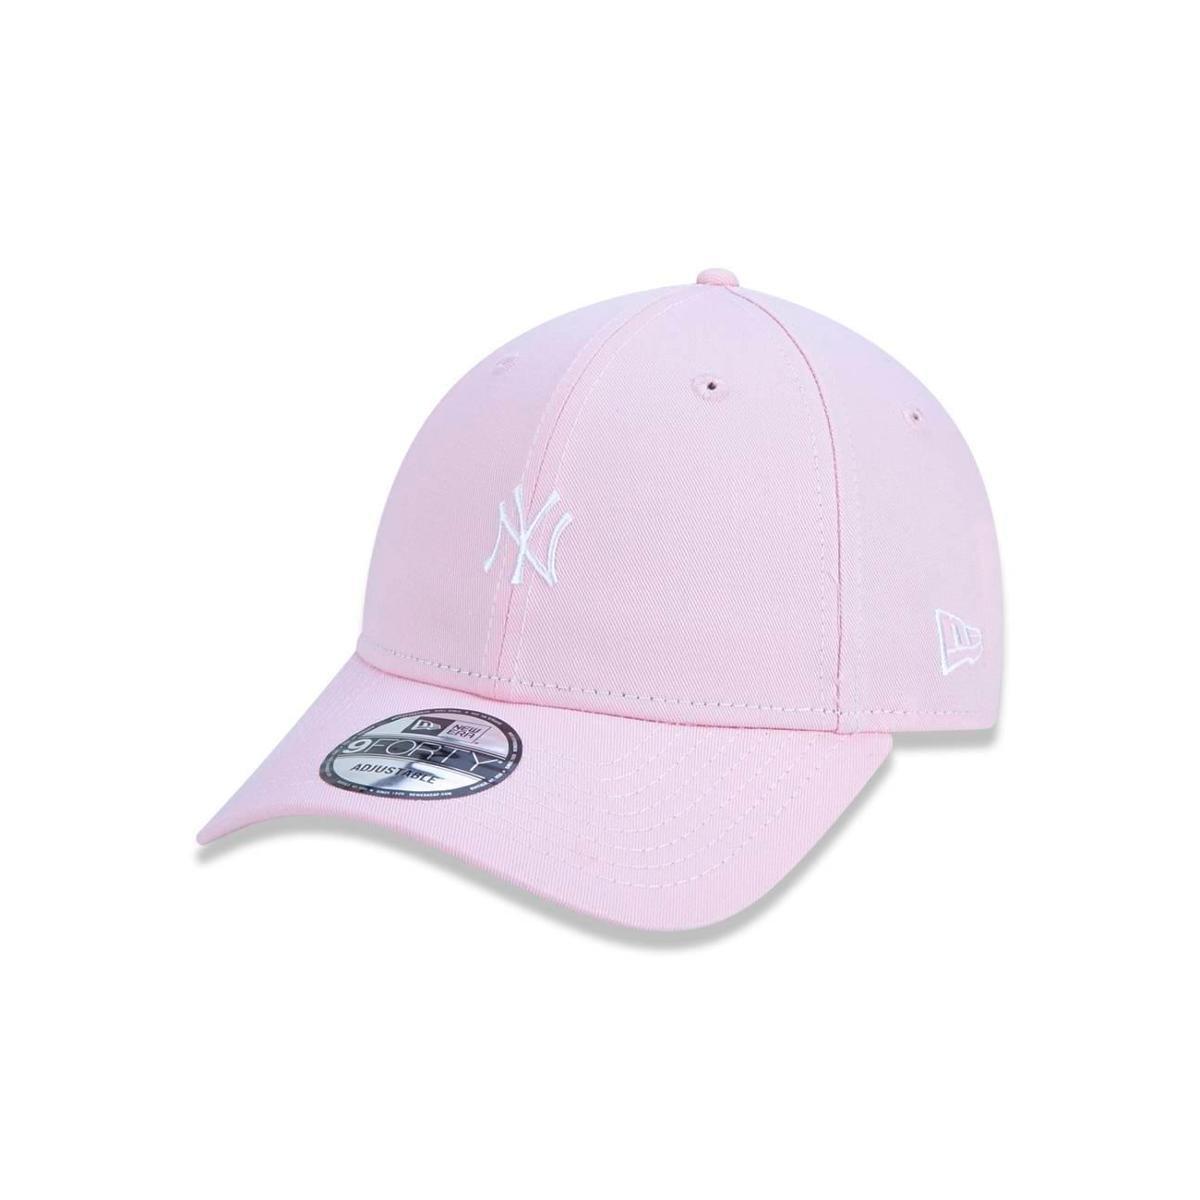 Boné 940 New York Yankees MLB Aba Curva New Era - Compre Agora  5f61b149e89